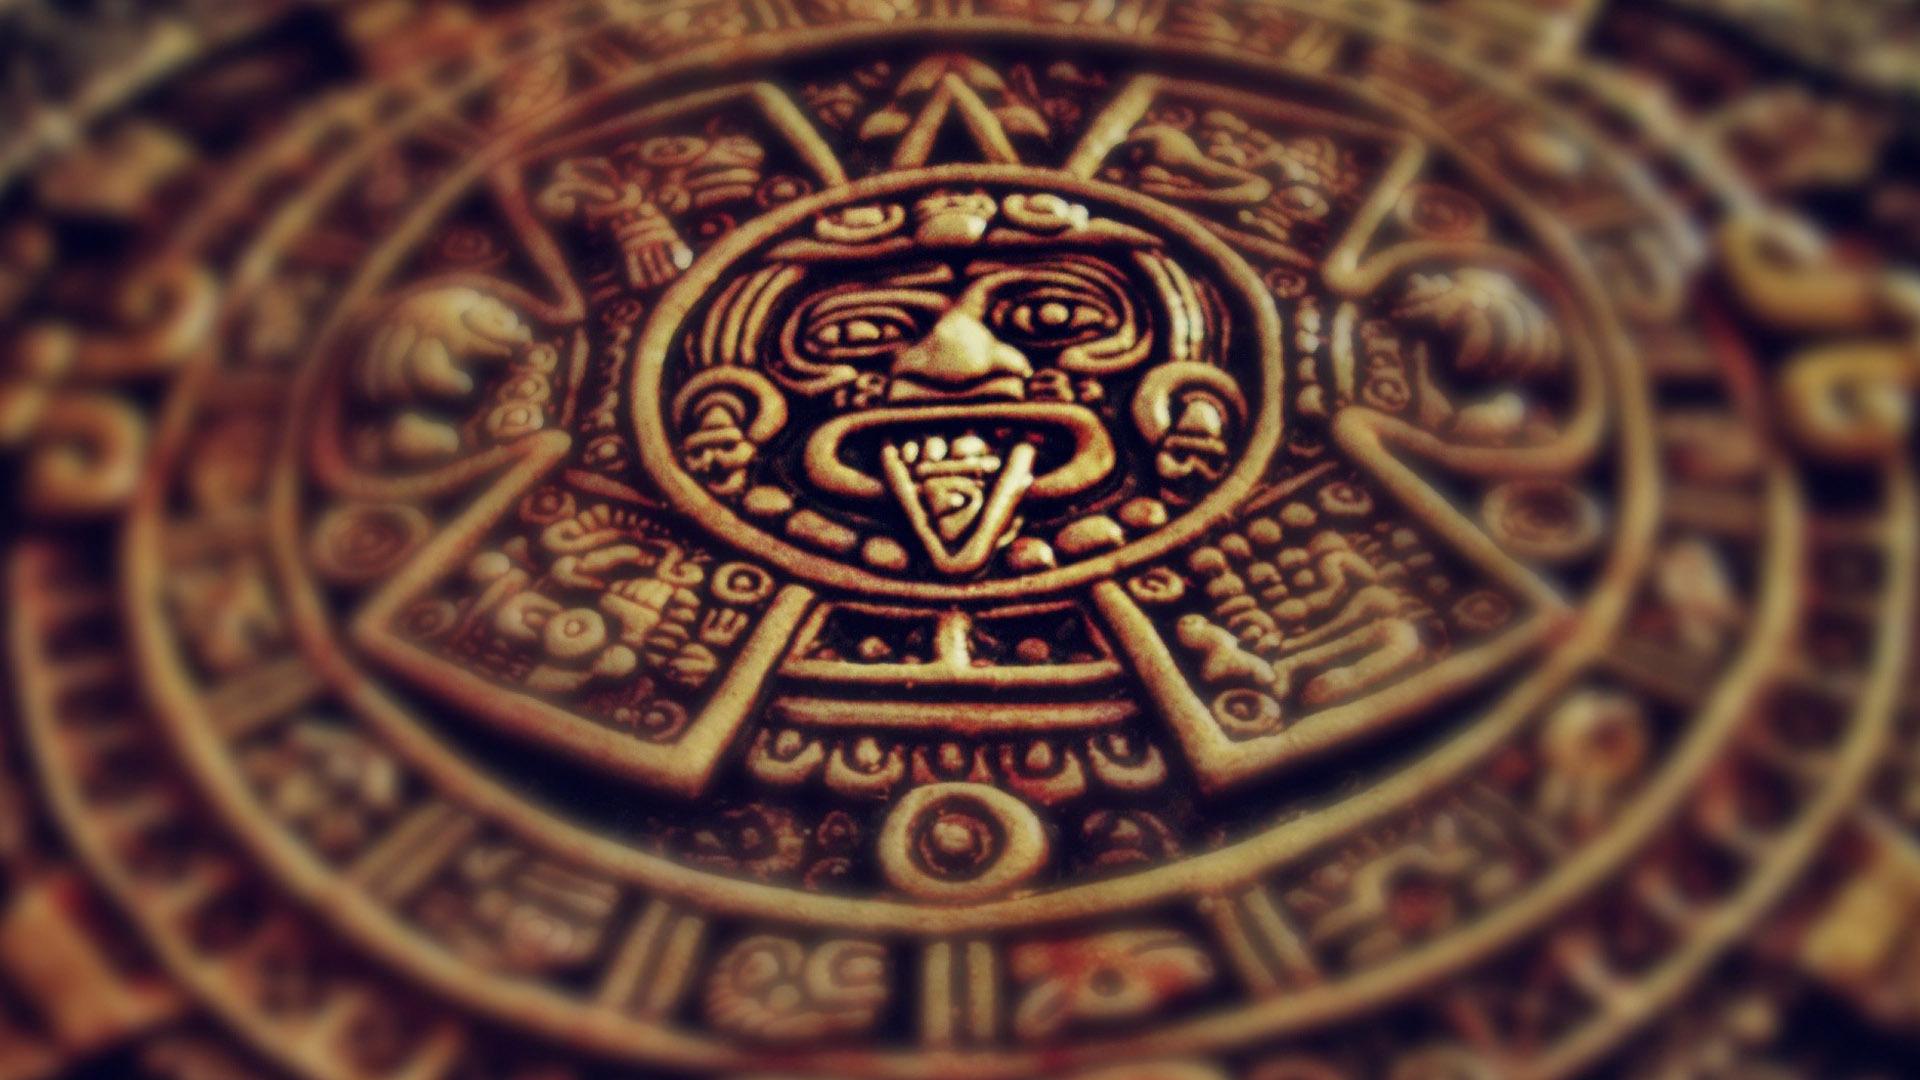 Aztec Calendar Wallpaper Backgrounds : Hd mayan wallpapers wallpapersafari